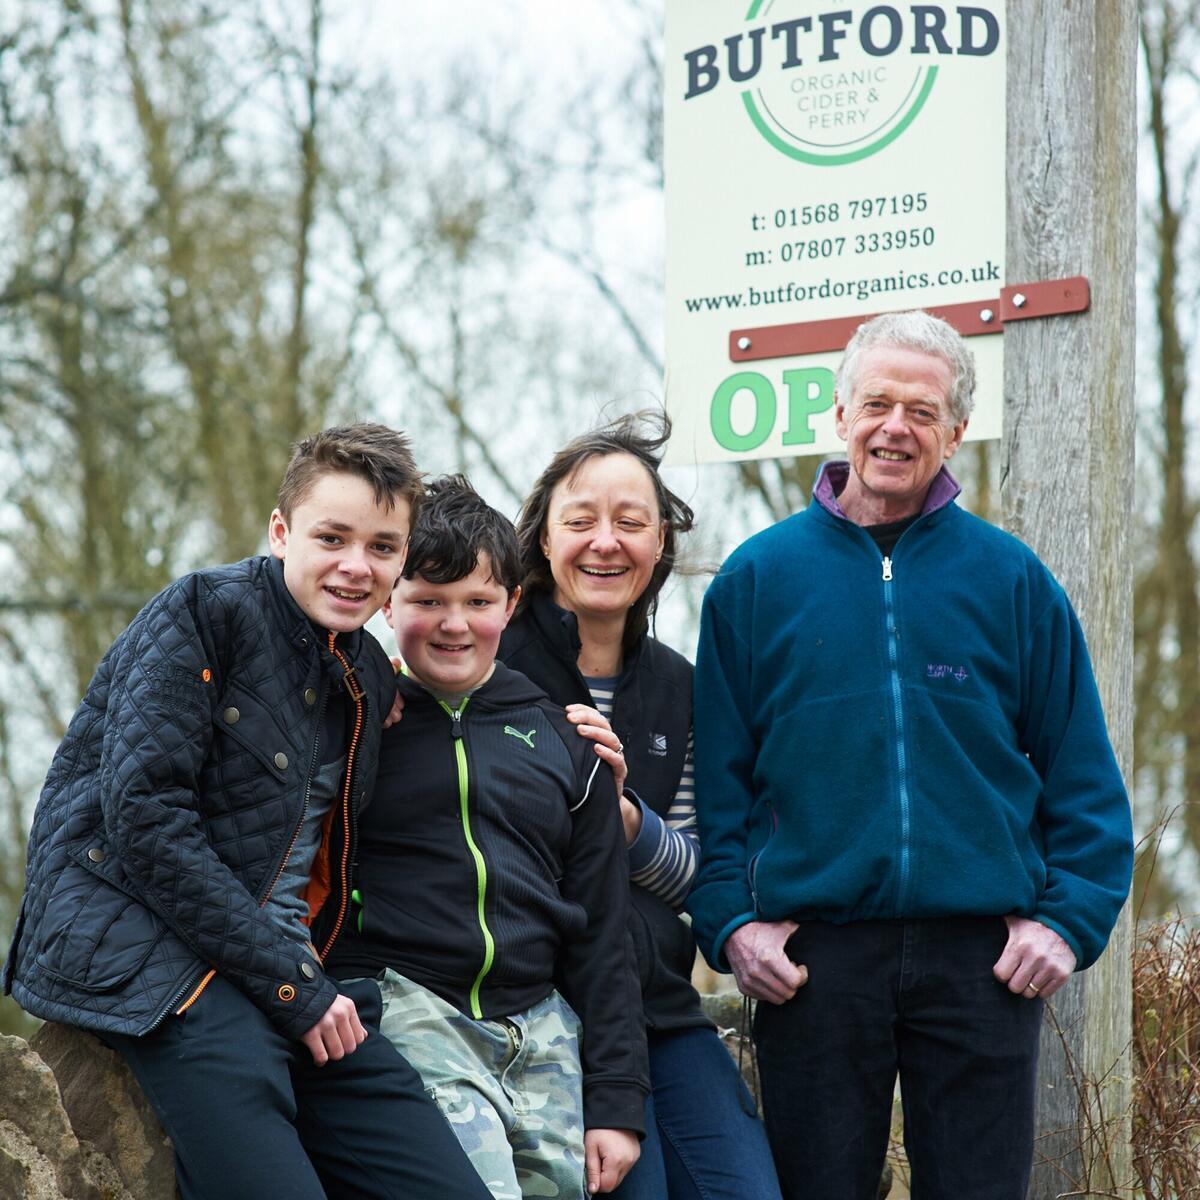 A family run business